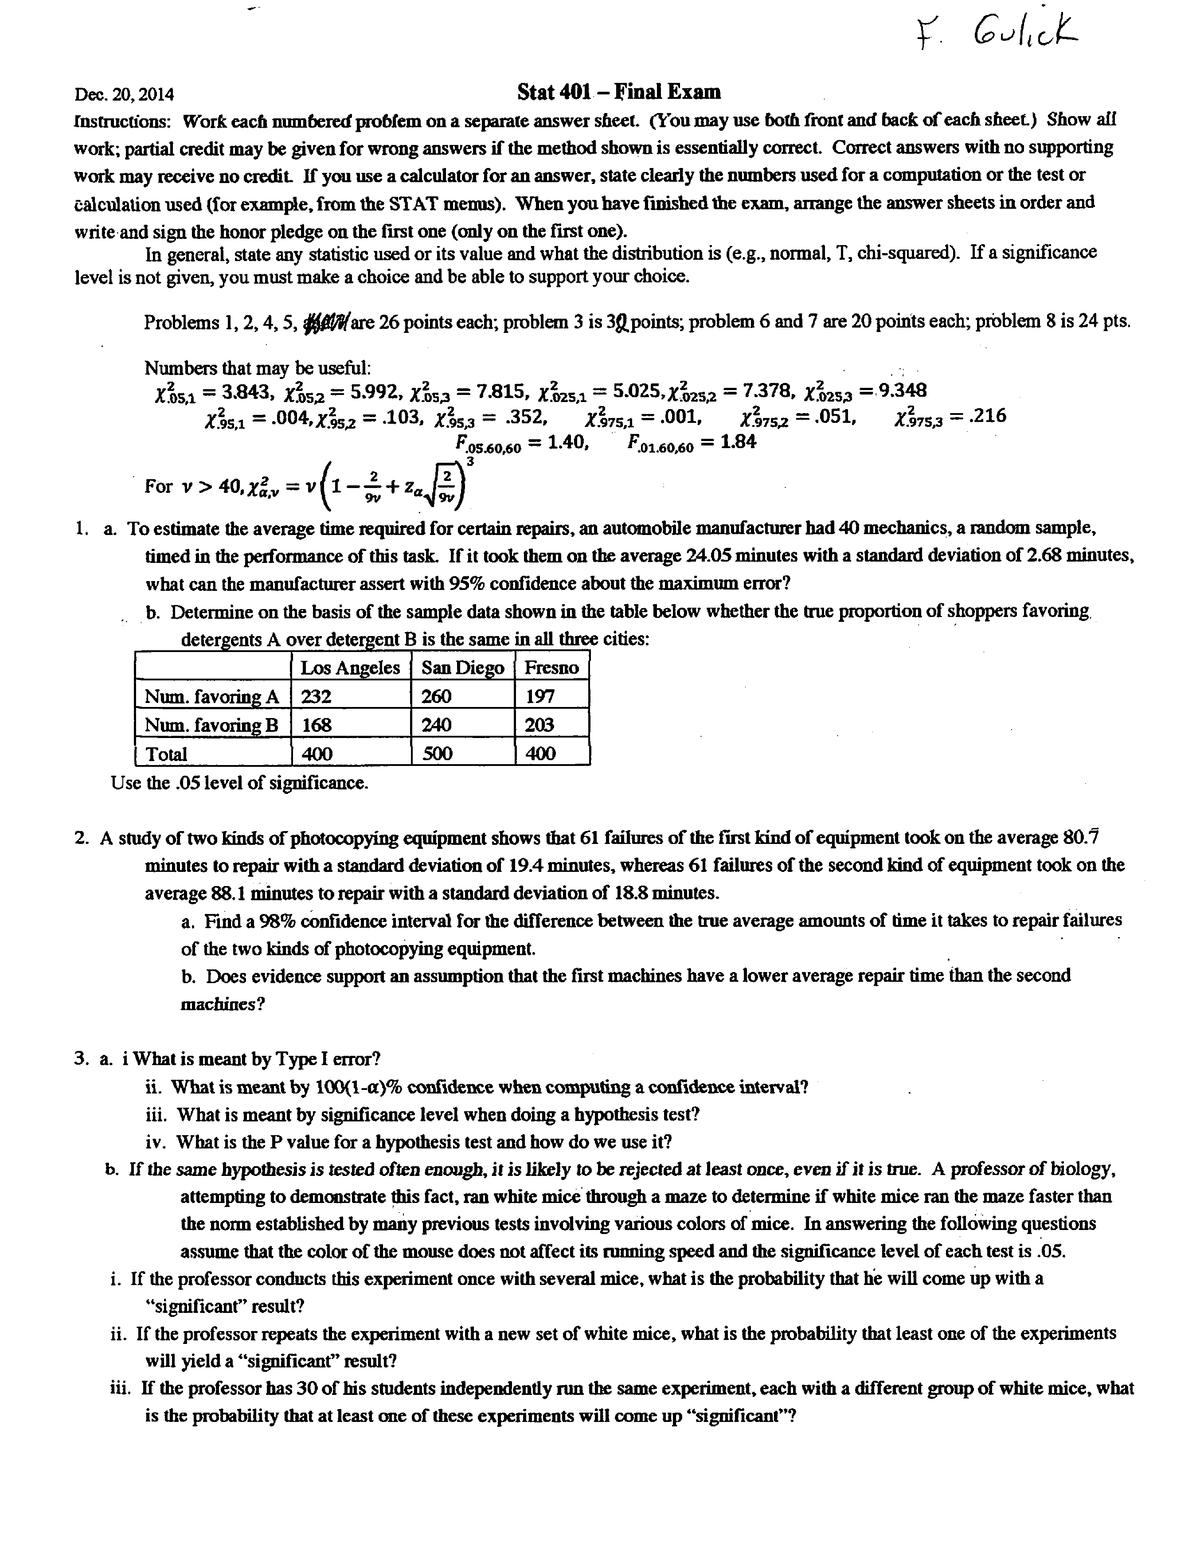 Exam 2014 - STAT401: Applied Probability and Statistics II - StuDocu